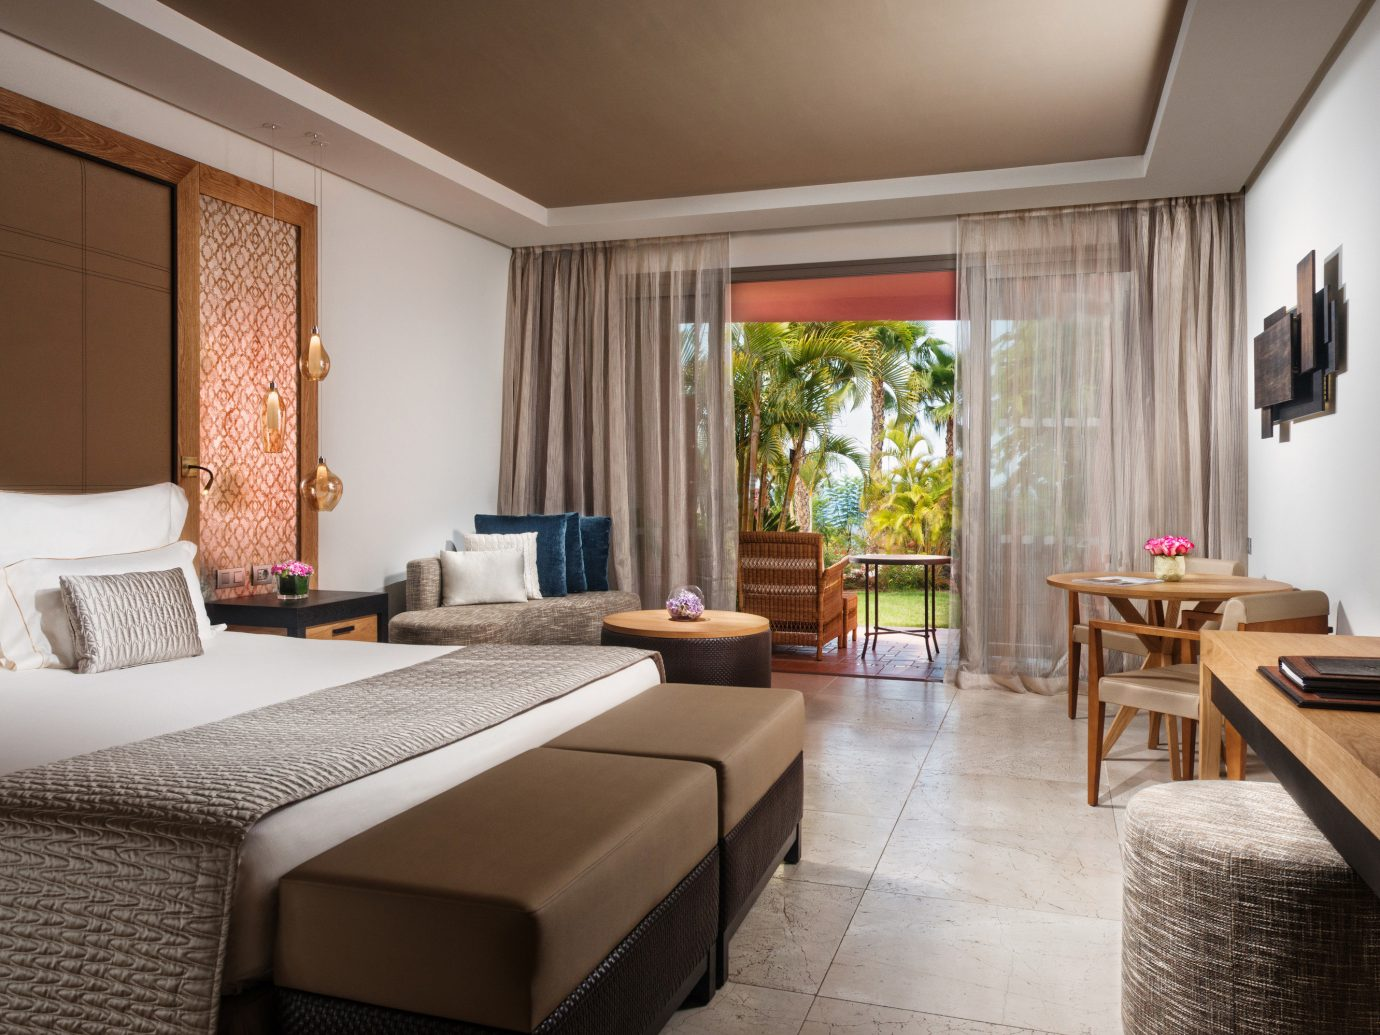 Trip Ideas indoor wall floor room Suite interior design hotel real estate ceiling Bedroom interior designer furniture